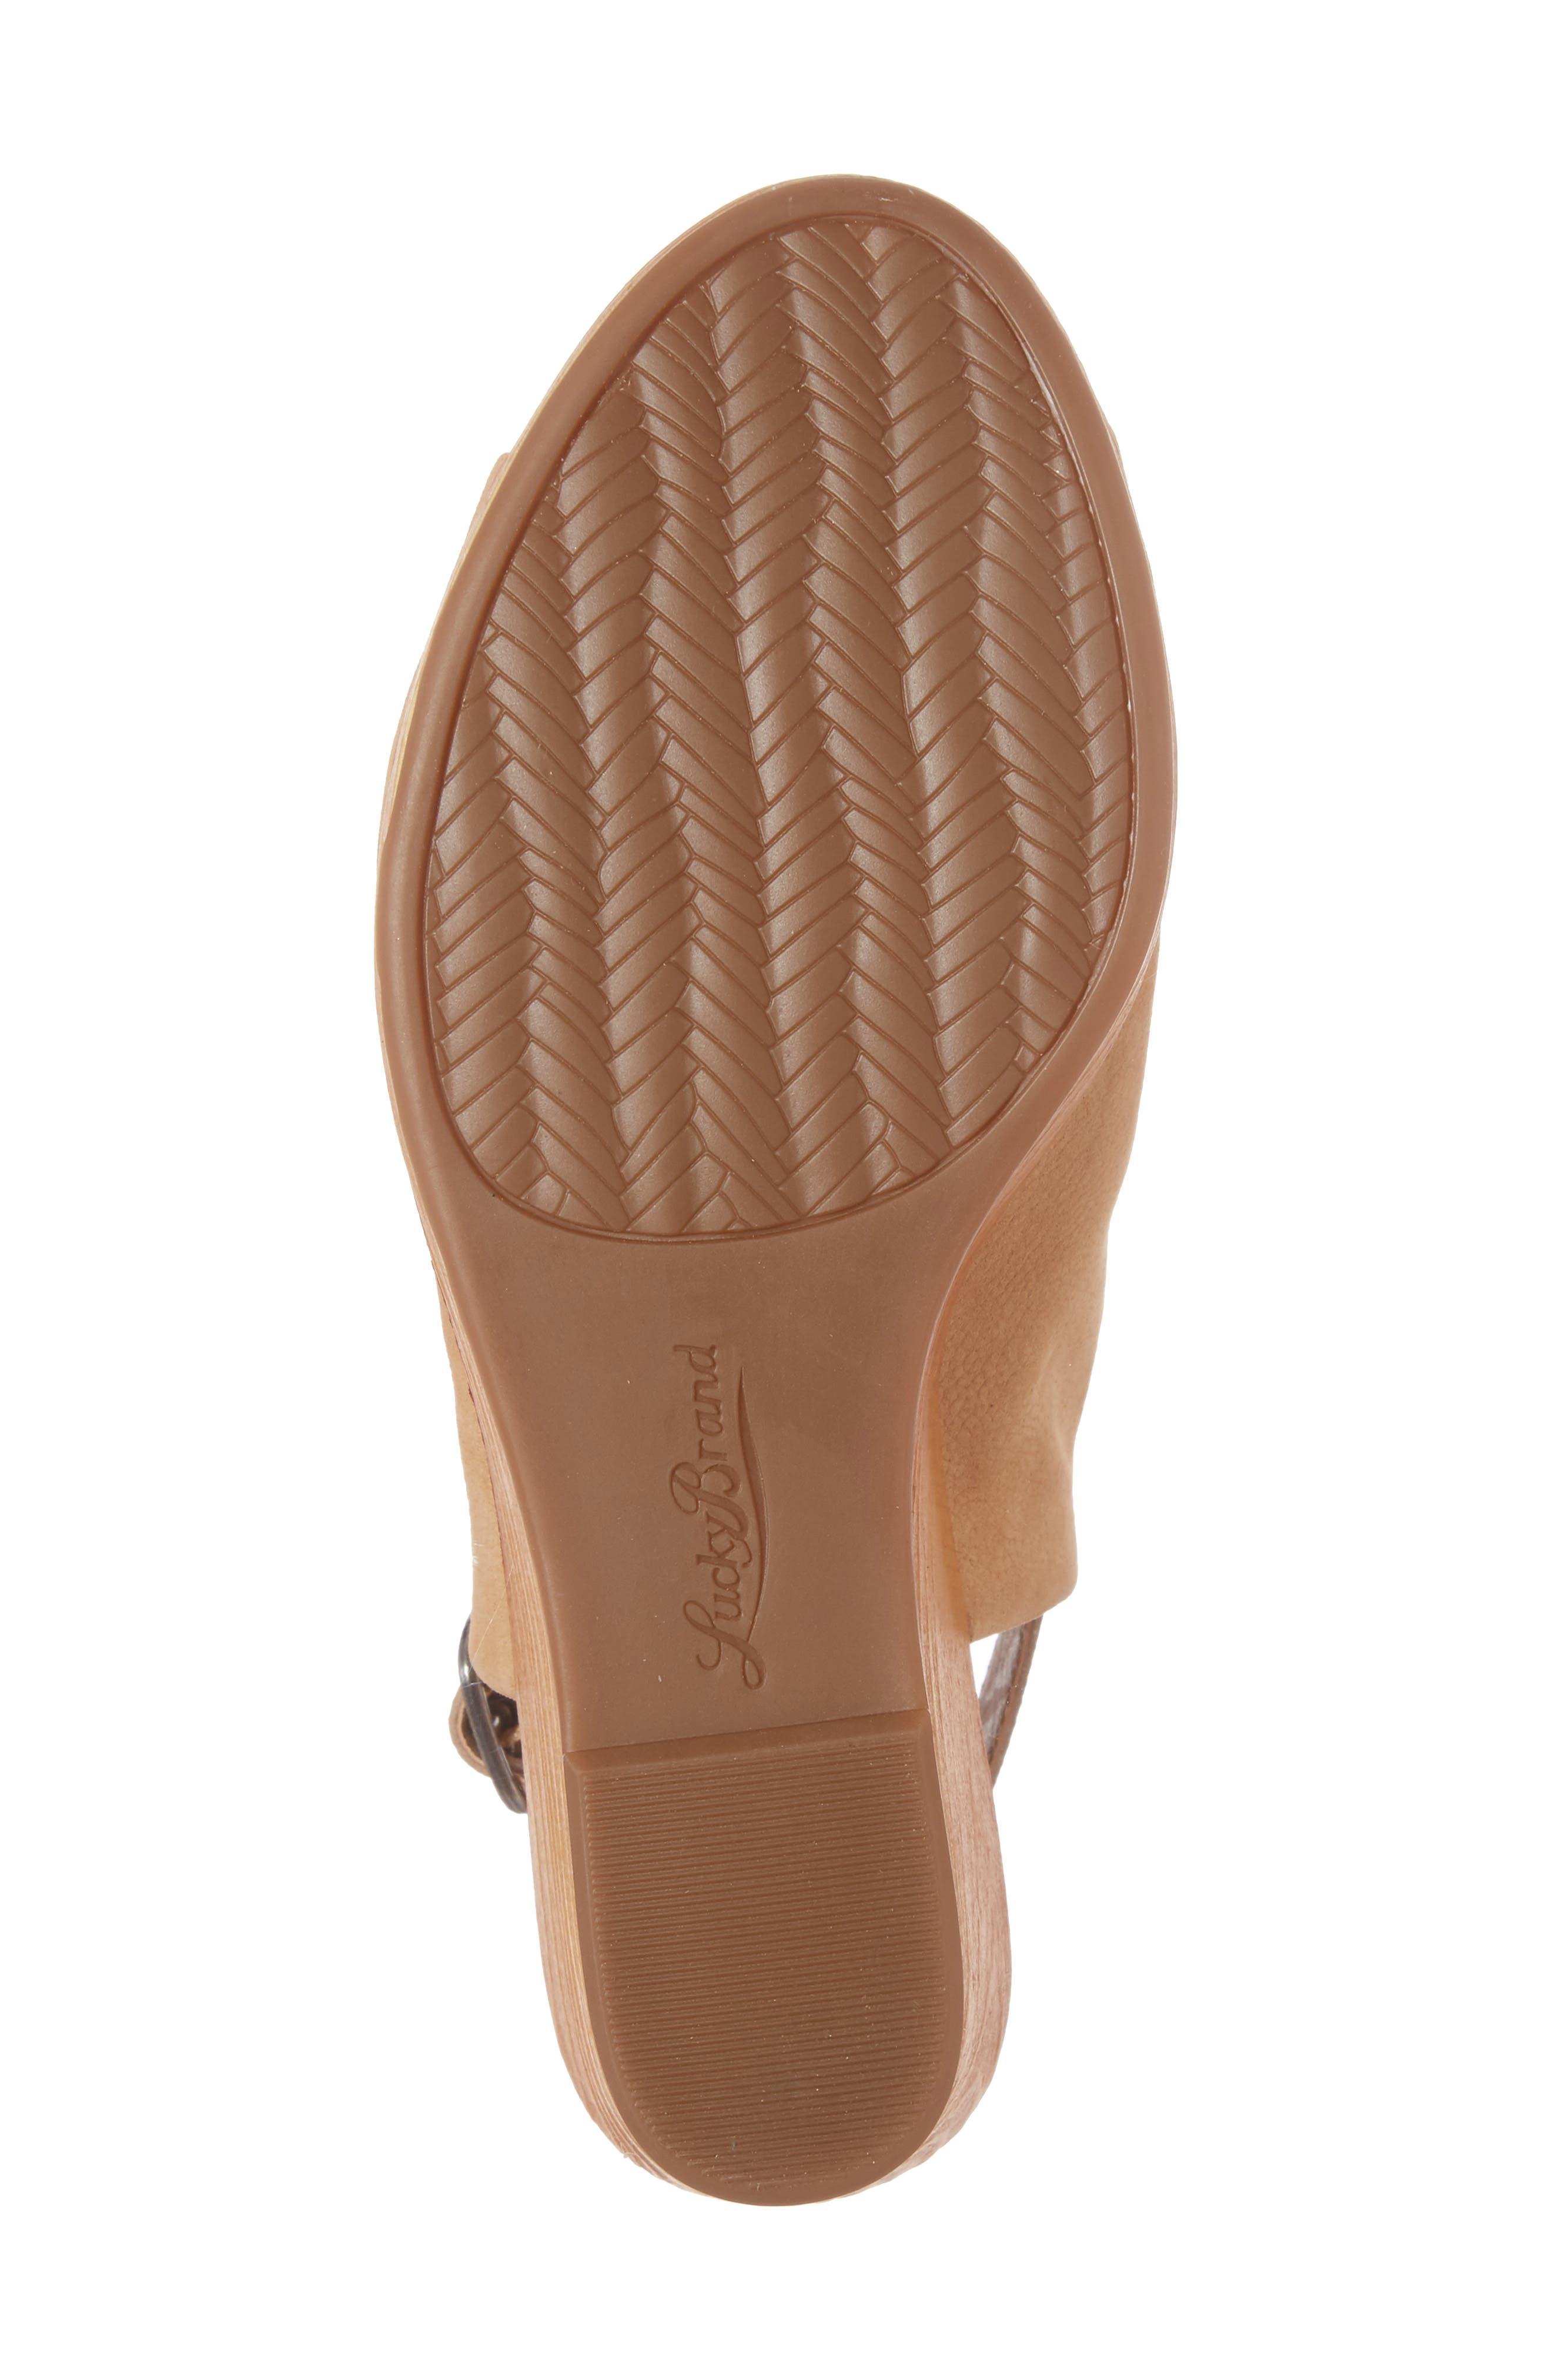 Keralin Wedge Sandal,                             Alternate thumbnail 6, color,                             Glazed Leather